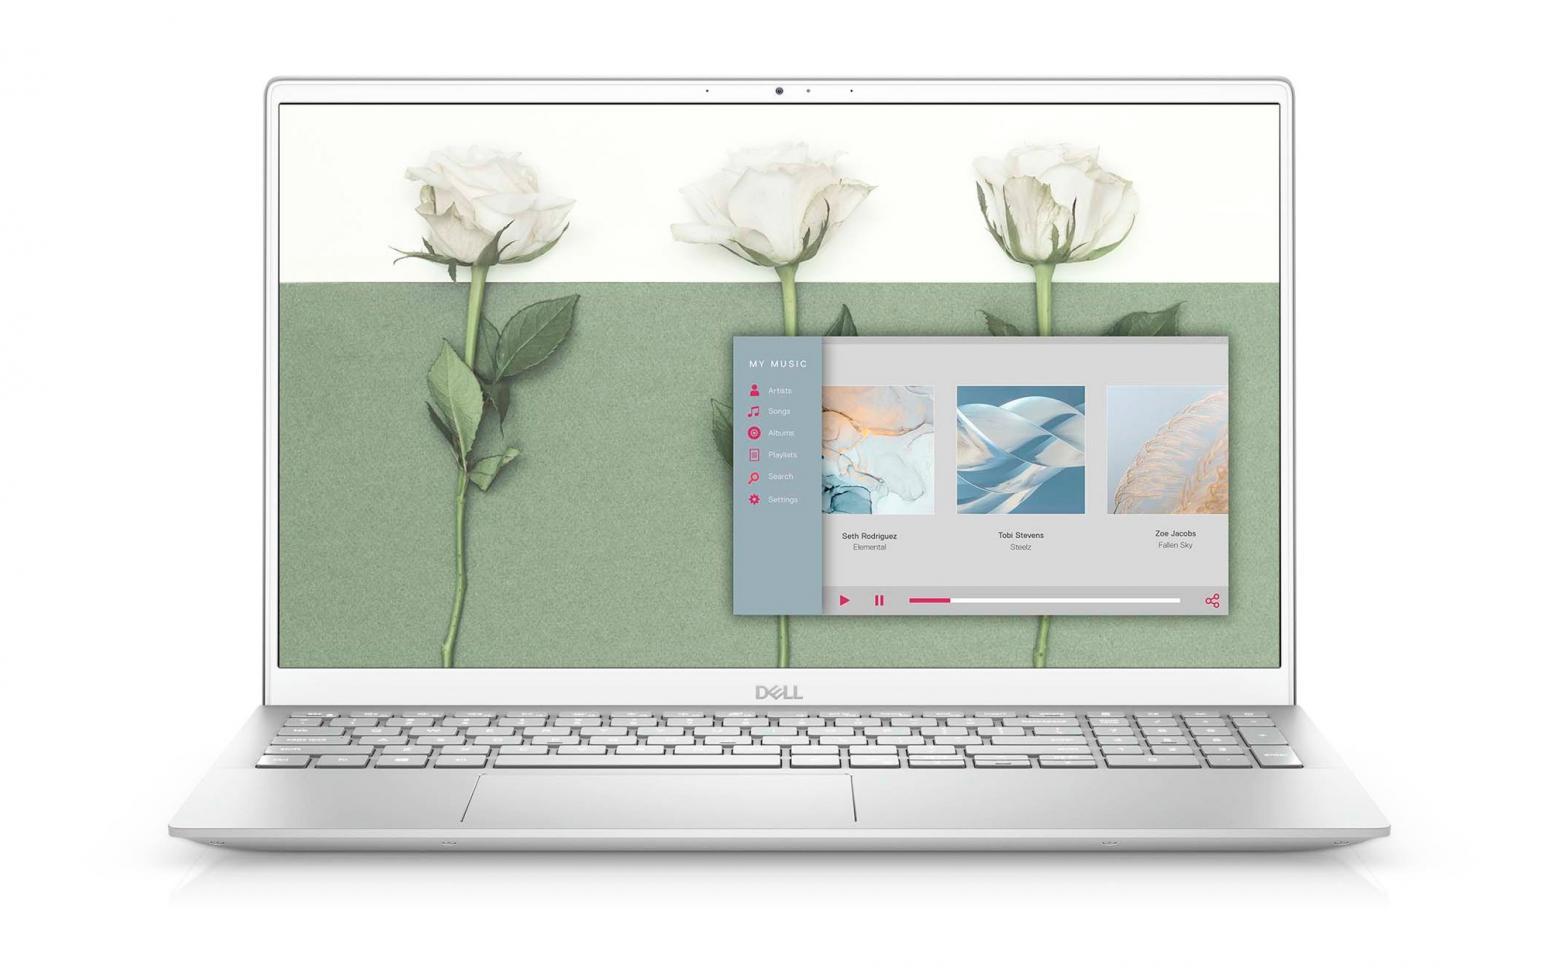 Ordinateur portable Dell Inspiron 15 5502 Argent - Core i5, SSD 256 Go - photo 6